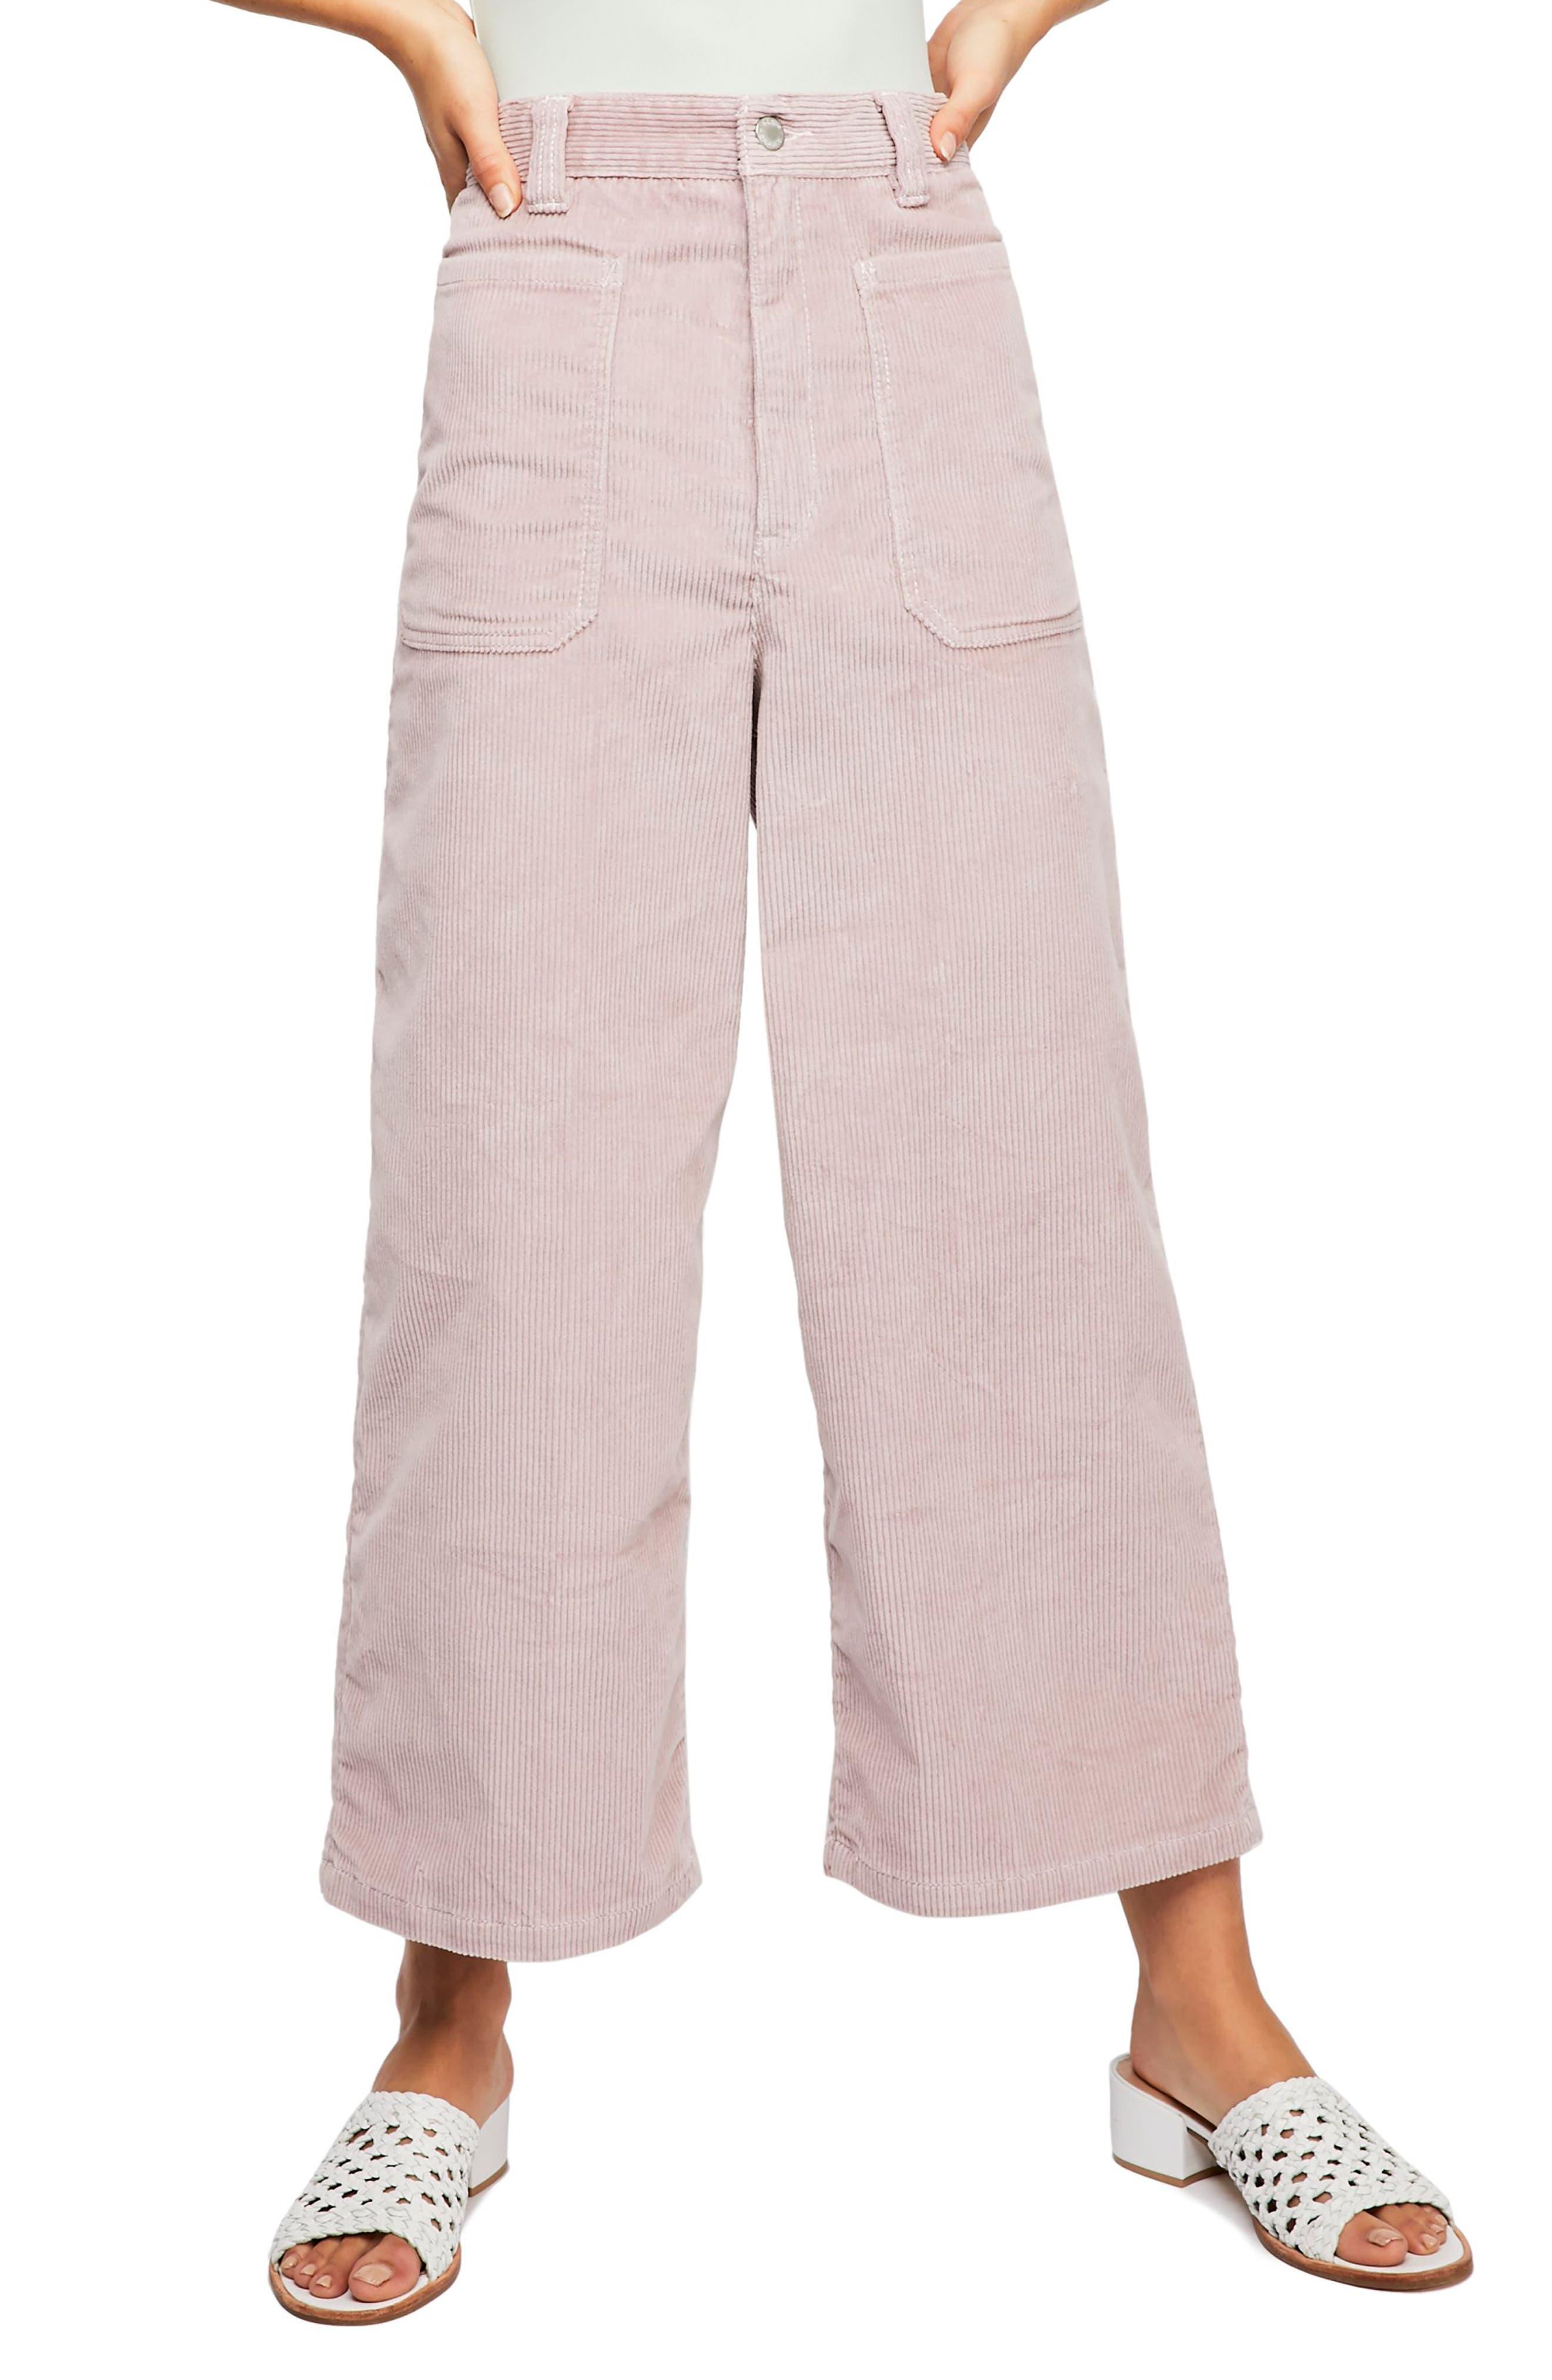 Dawn to Dusk Crop Corduroy Pants,                         Main,                         color, ROSE